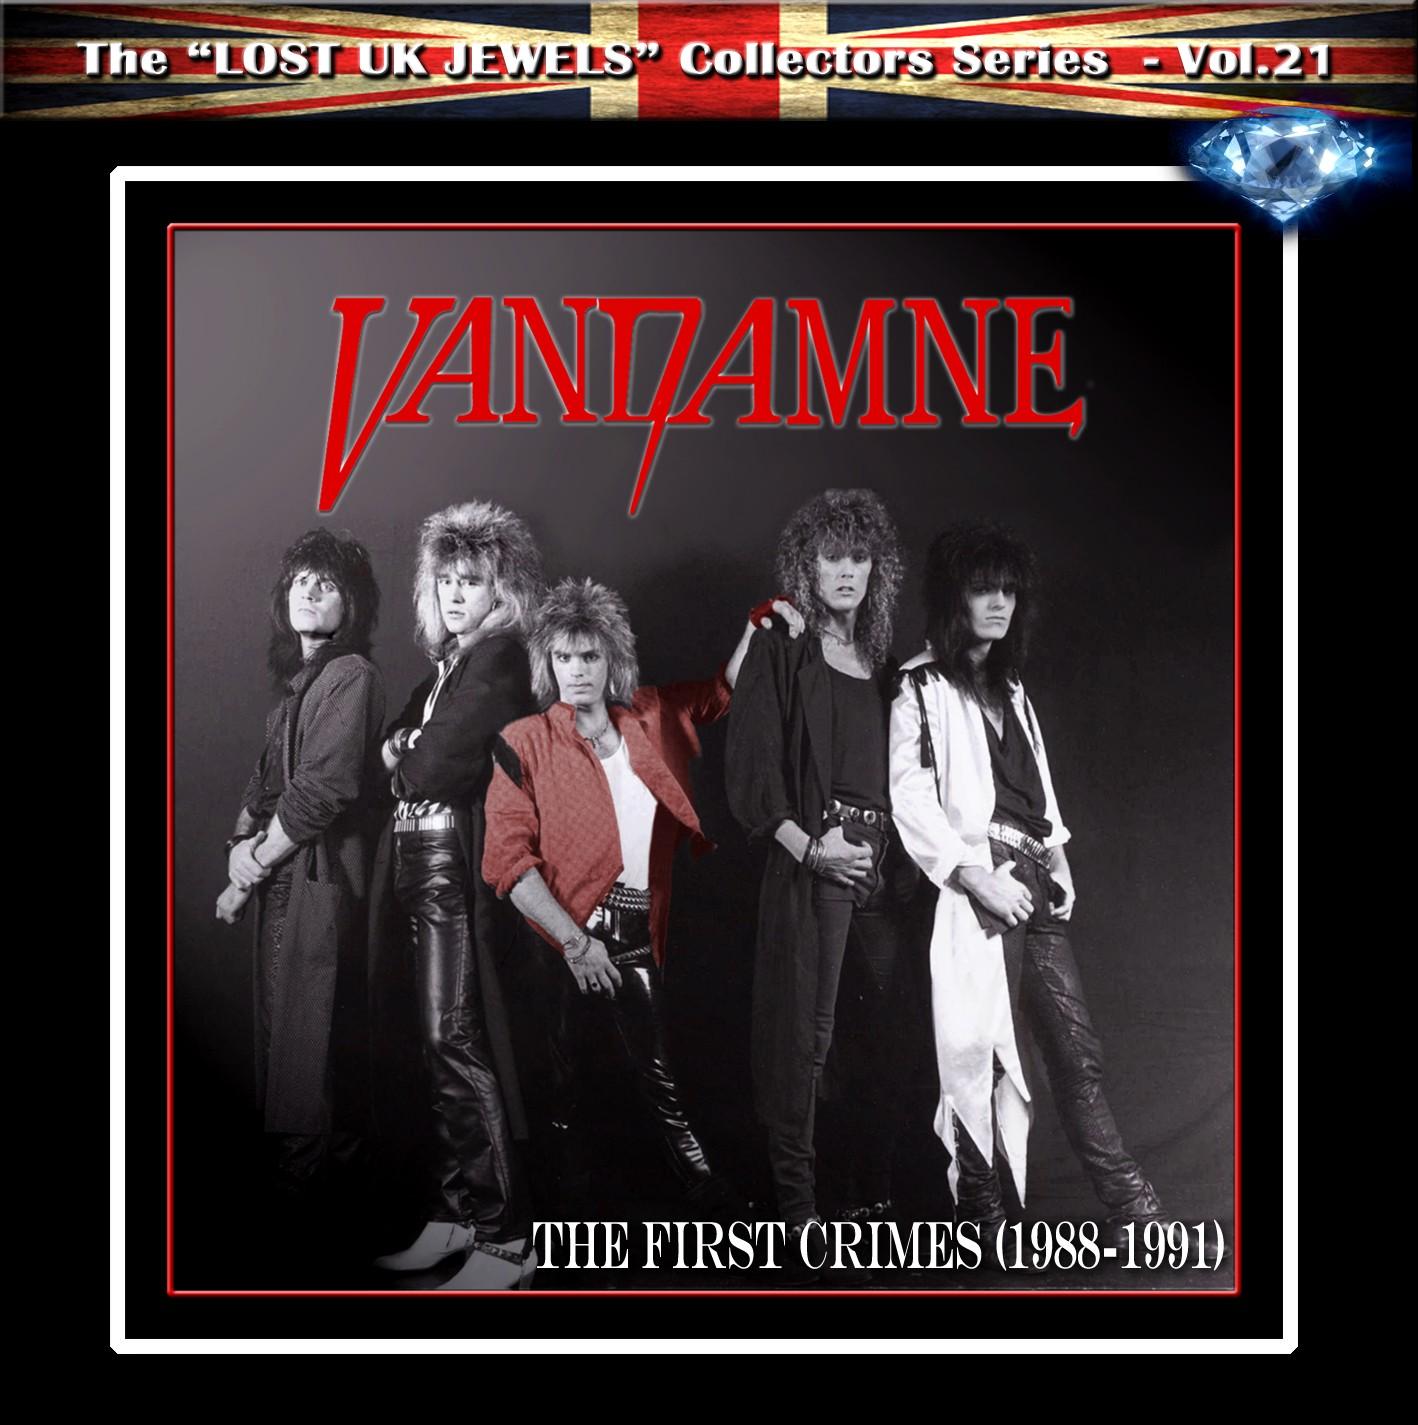 VANDAMNE - The First Crimes (digitally remastered)